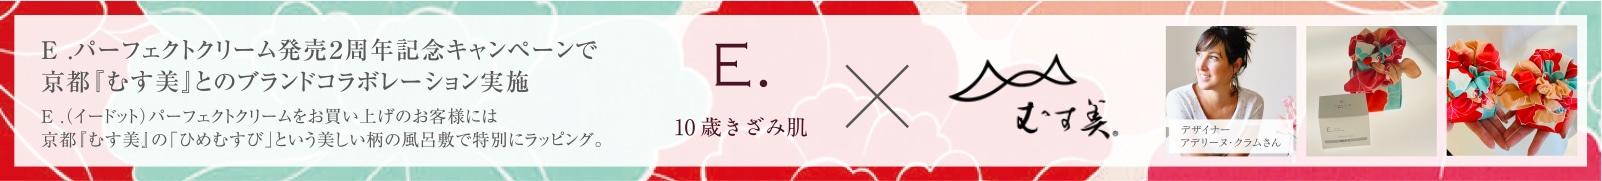 E.パーフェクトクリーム発売2周年記念キャンペーンで京都「むす美」とのブランドコラボレーション実施